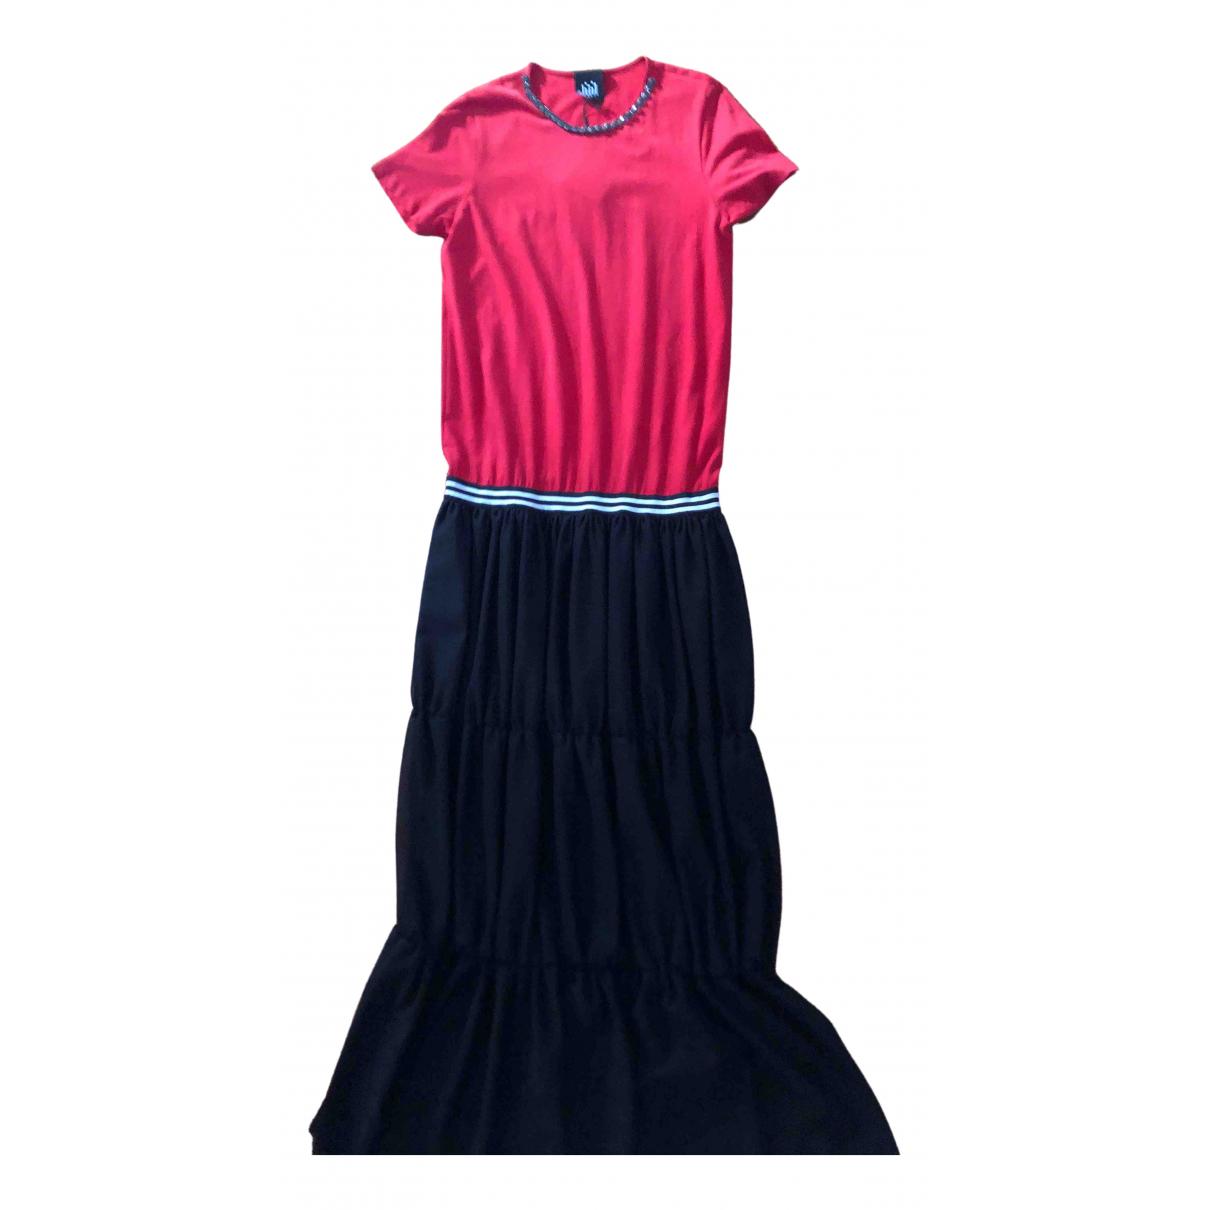 Jijil \N Red Cotton dress for Women 40 IT